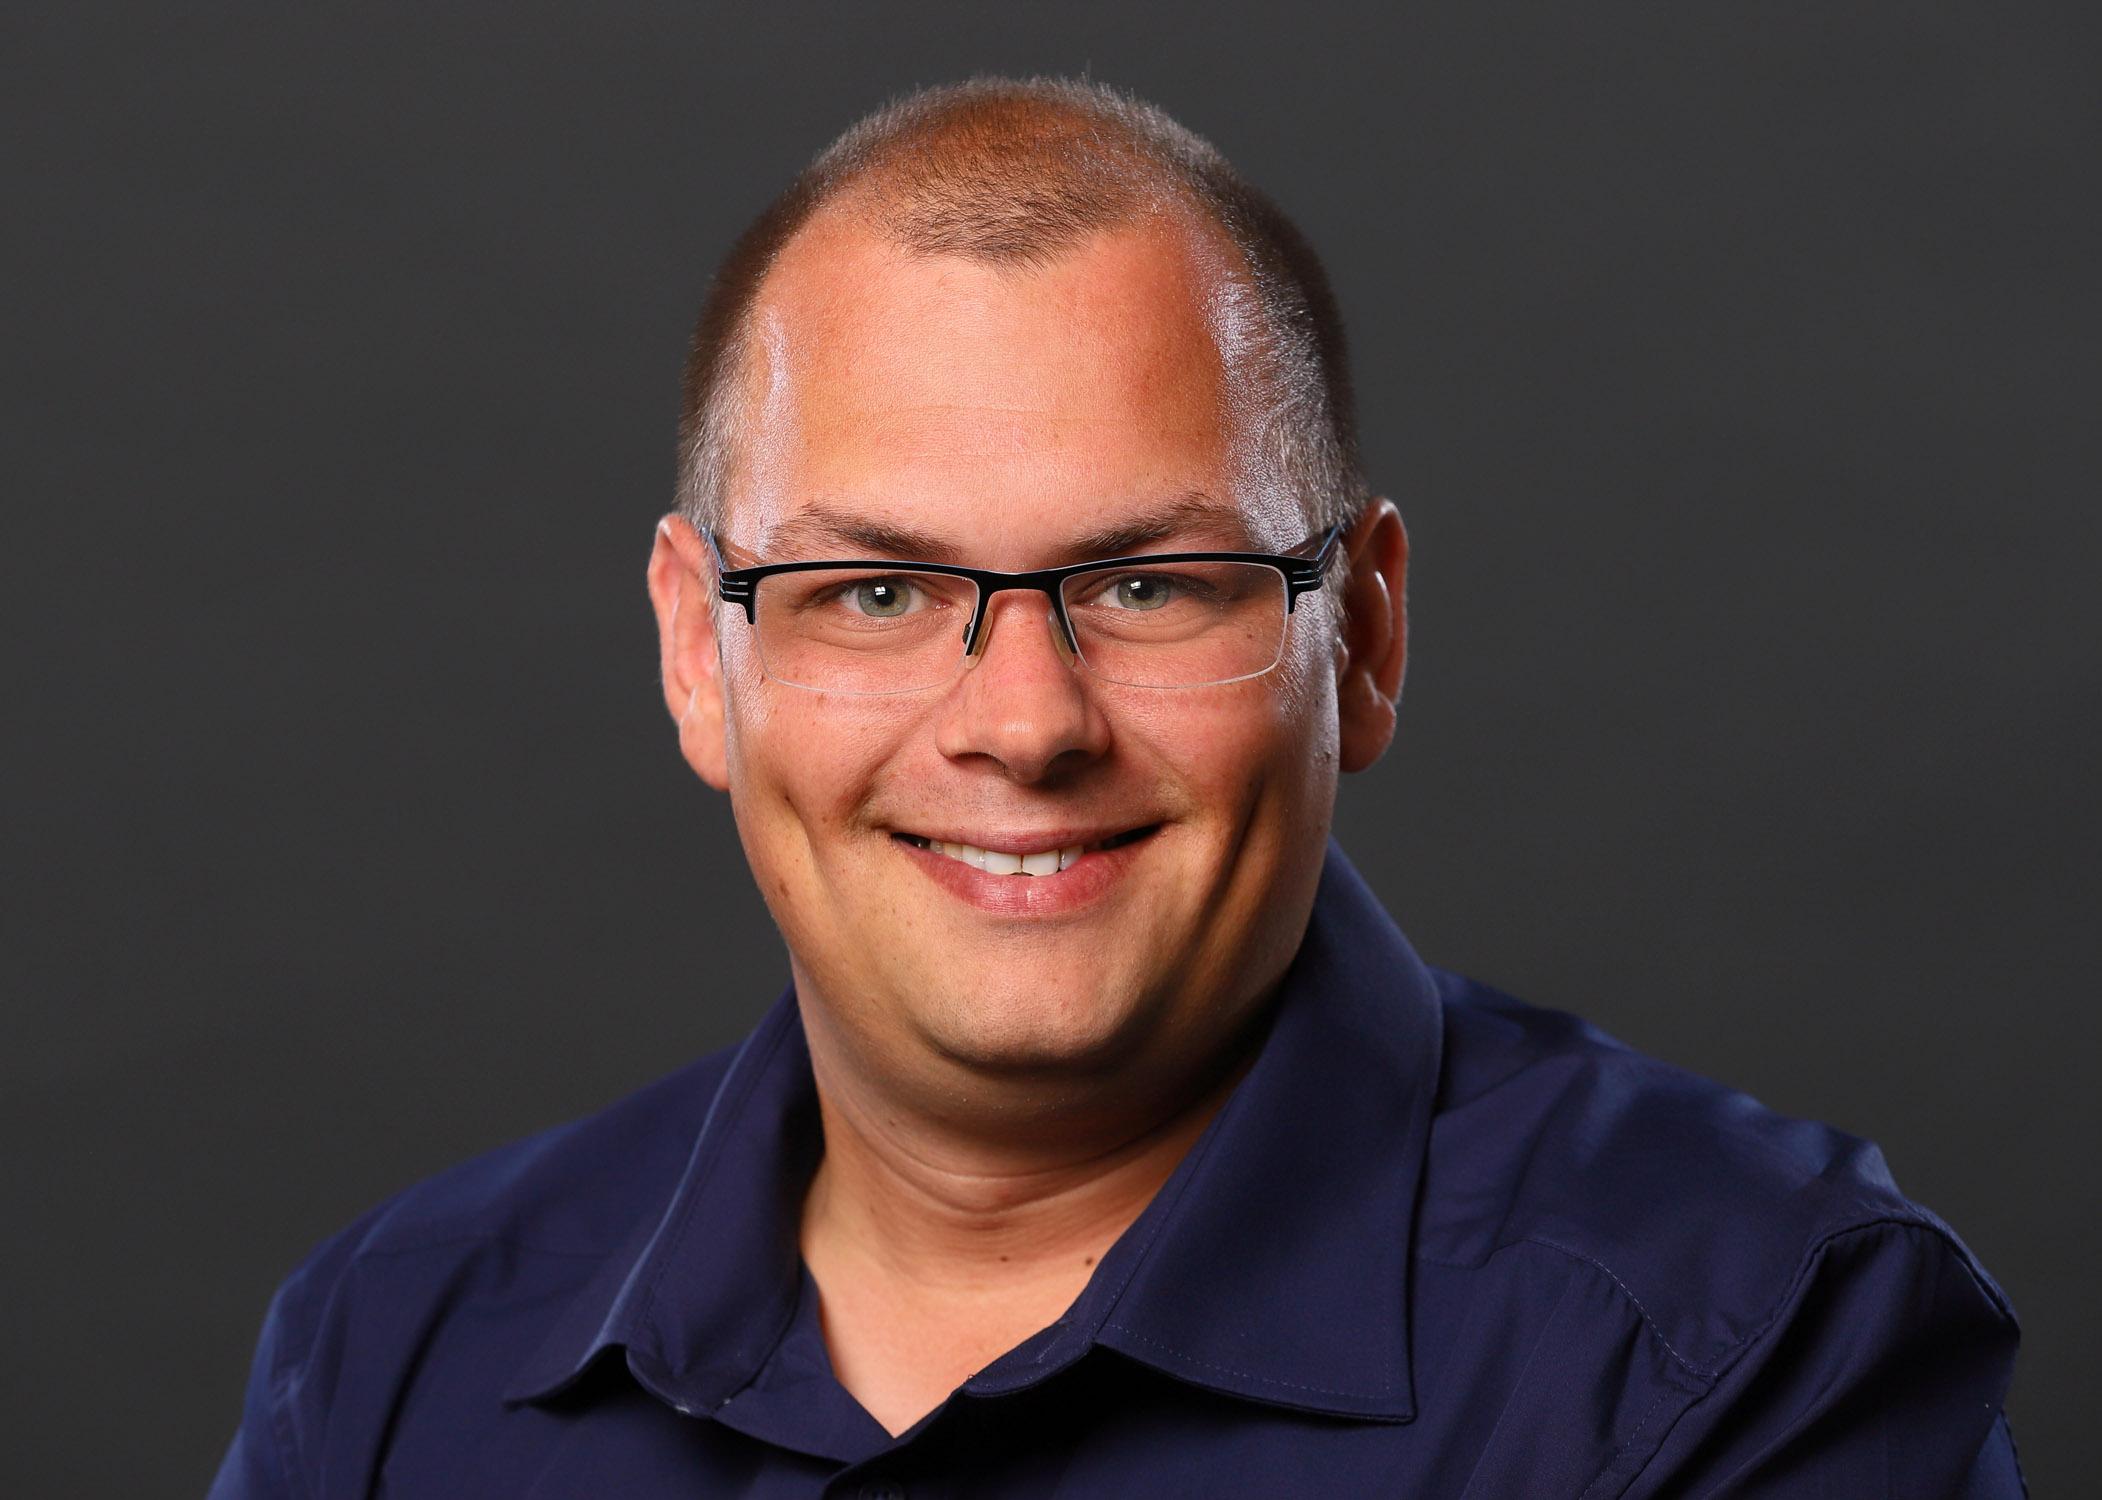 Stefan Schmedemann